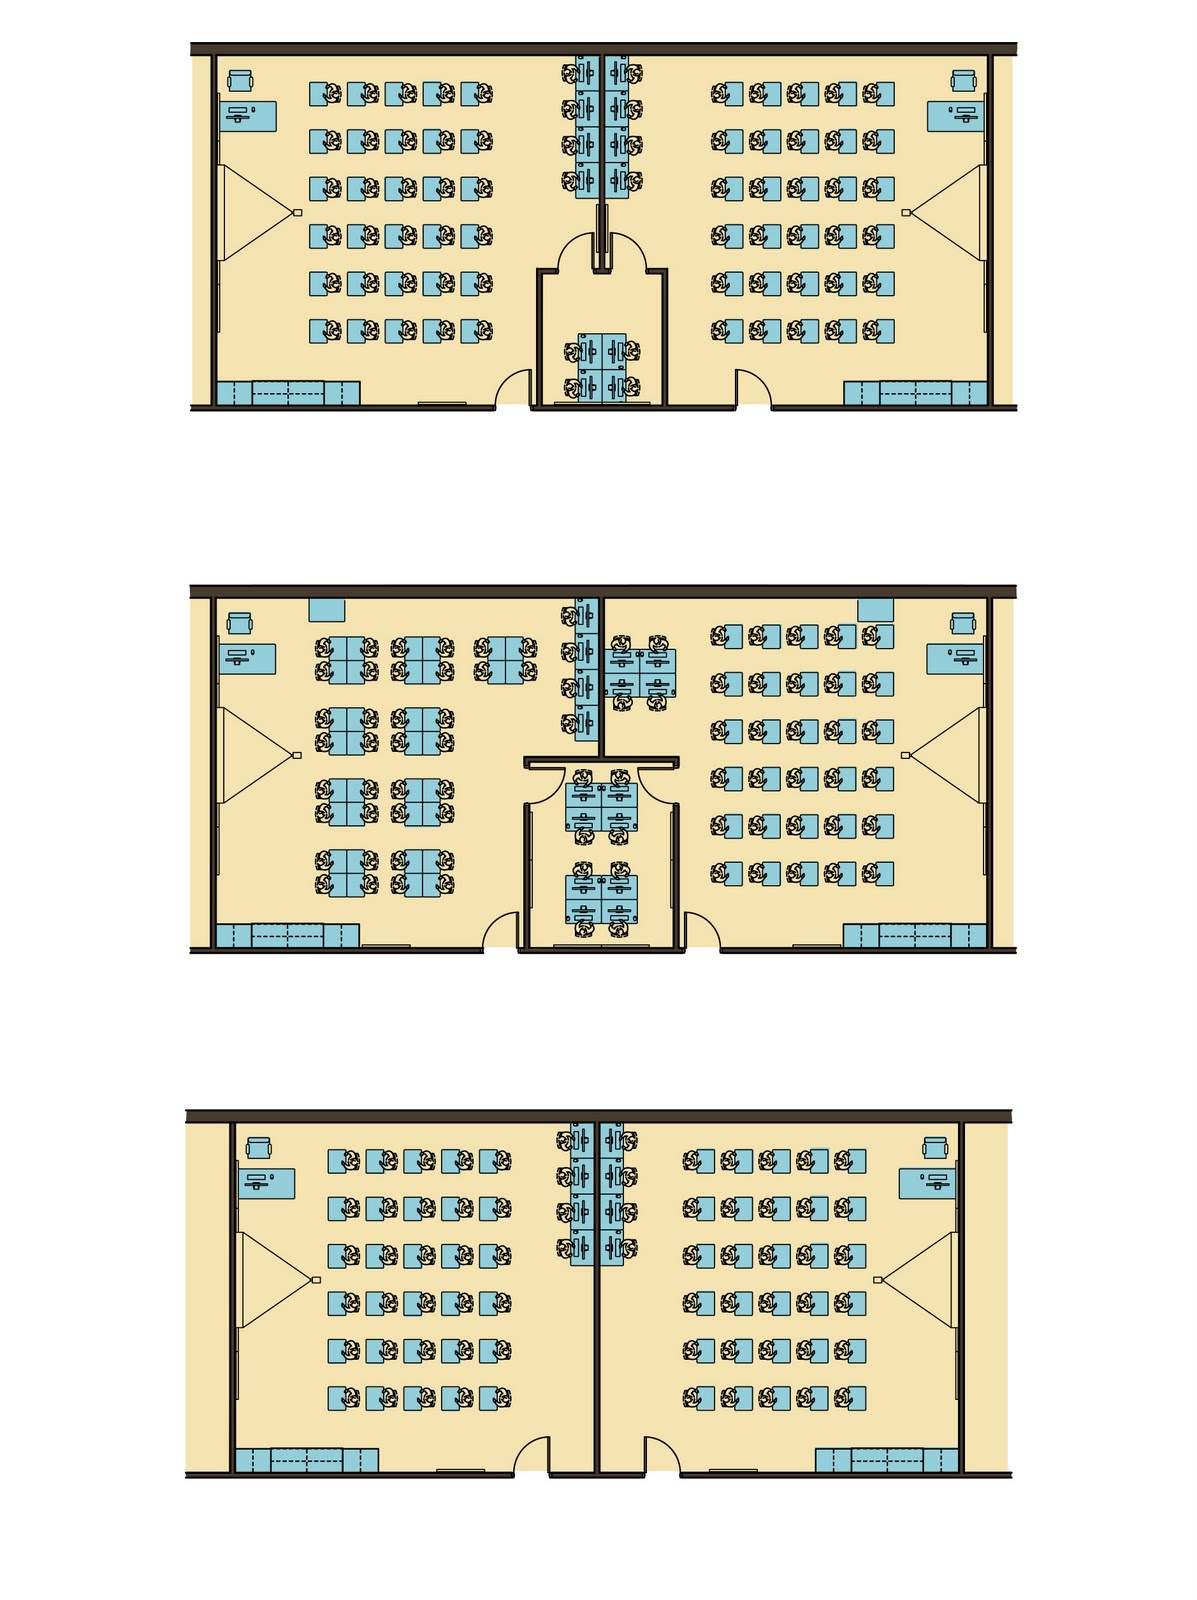 Bedford High School Classroom Layout Options